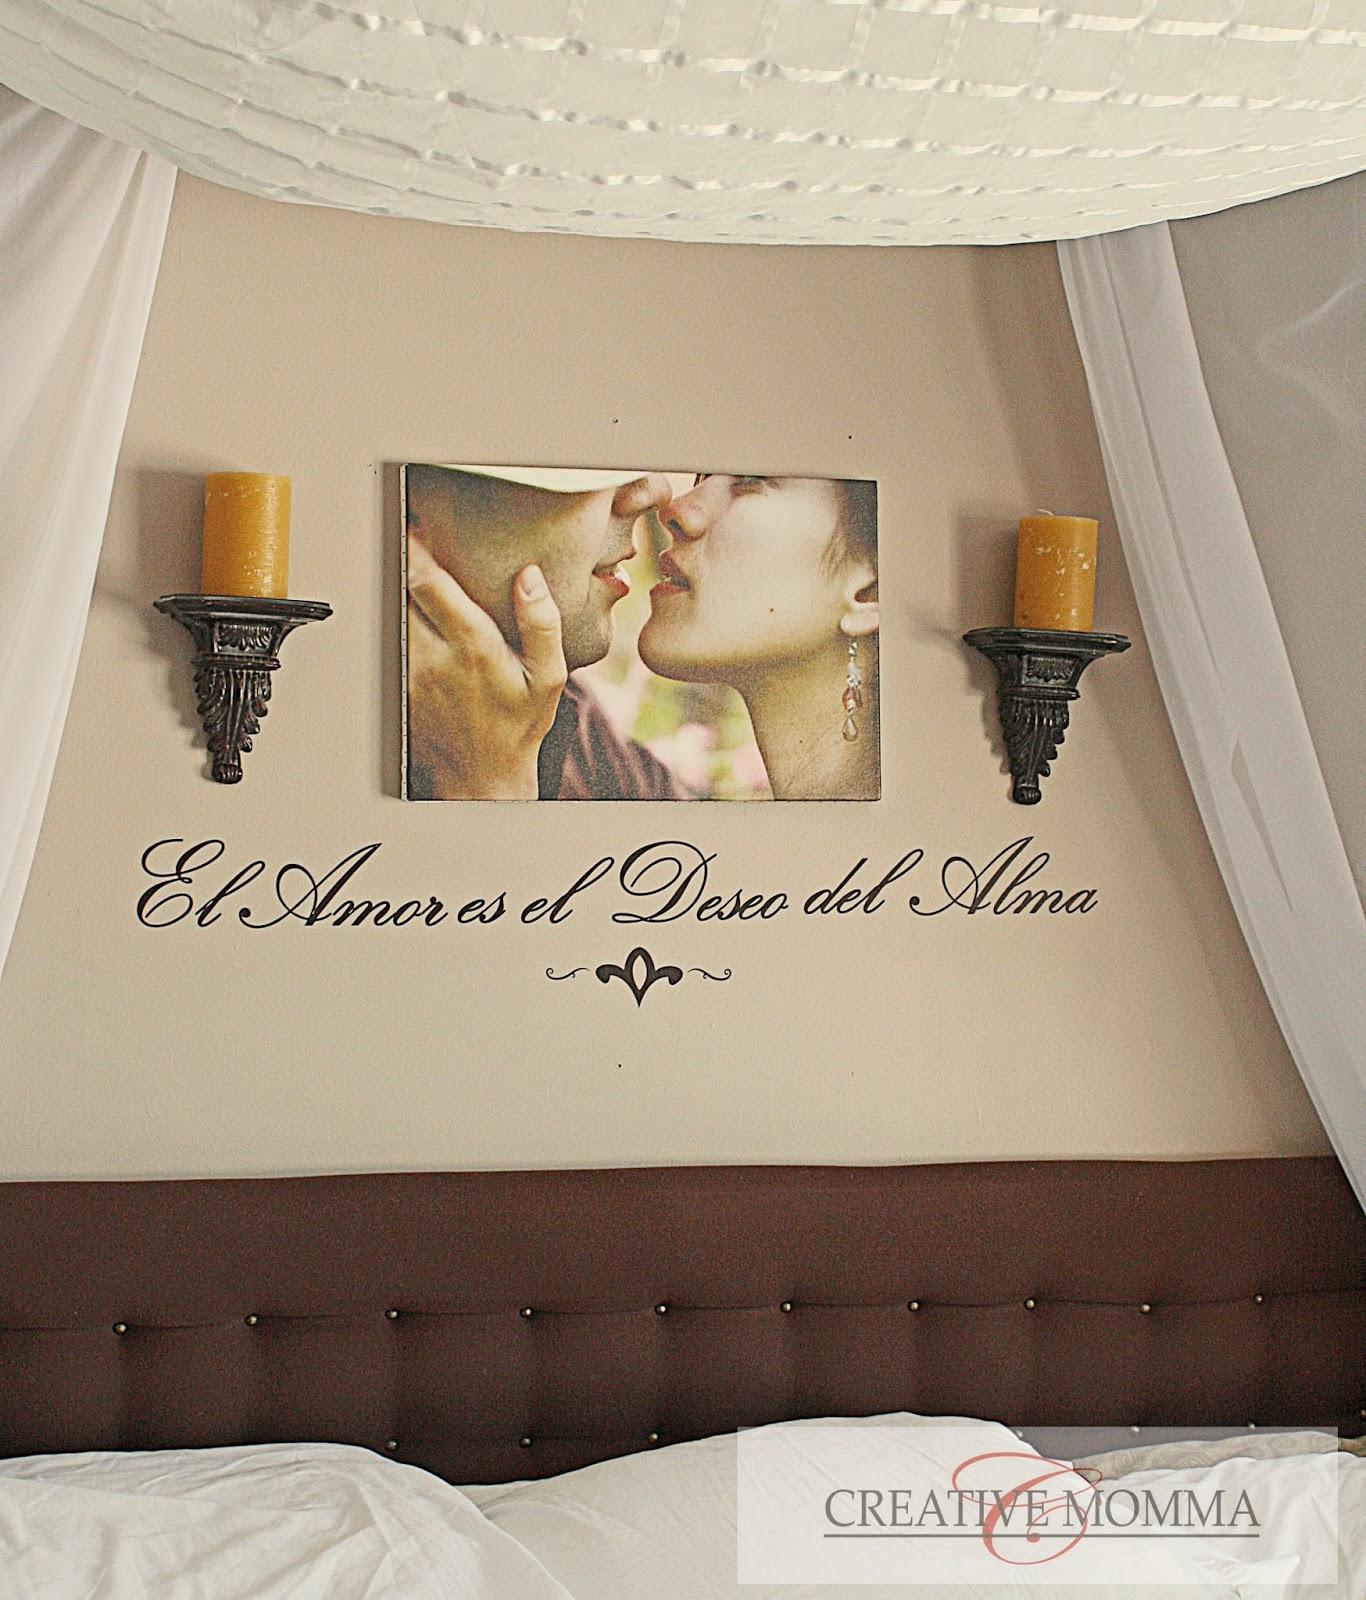 Couple bedroom wall decoration ideas - Couple Bedroom Wall Decoration Ideas 46